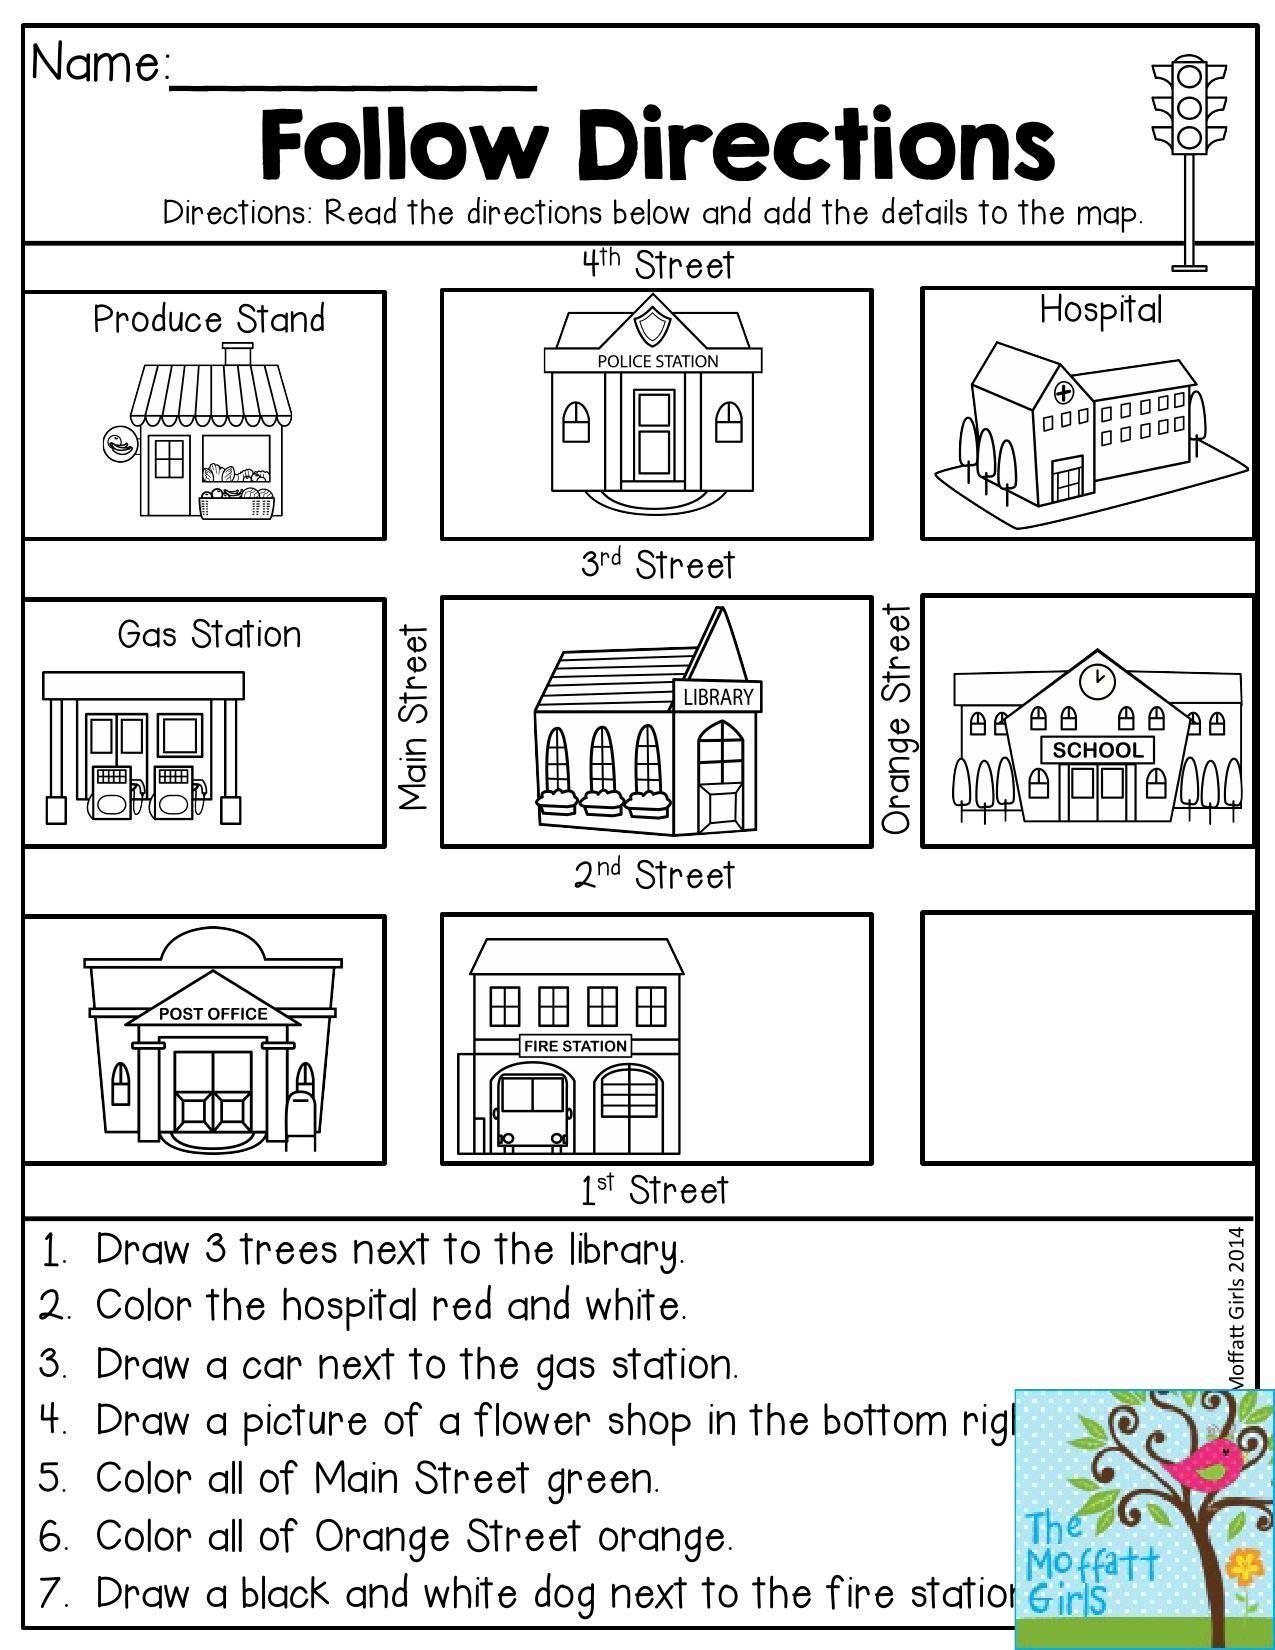 Pin By Sumbul 1999 On Perceptual Social Studies Worksheets Kindergarten Social Studies Map Skills Worksheets Free printable map worksheets for 3rd